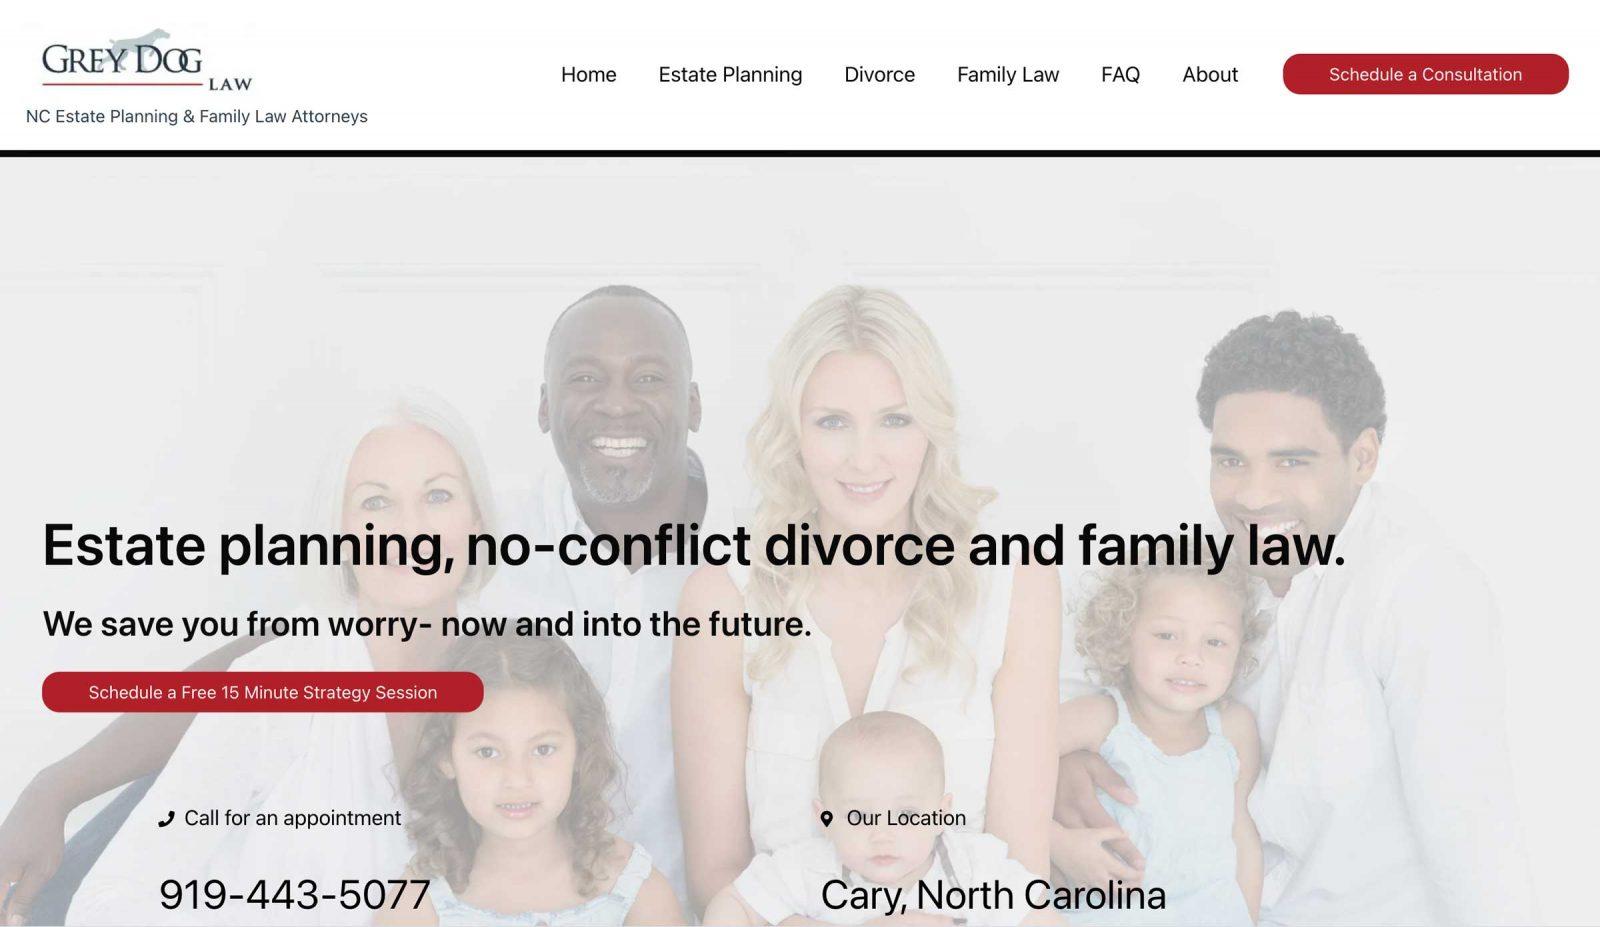 Grey Dog Law website designed by Web Luminary Cary, NC